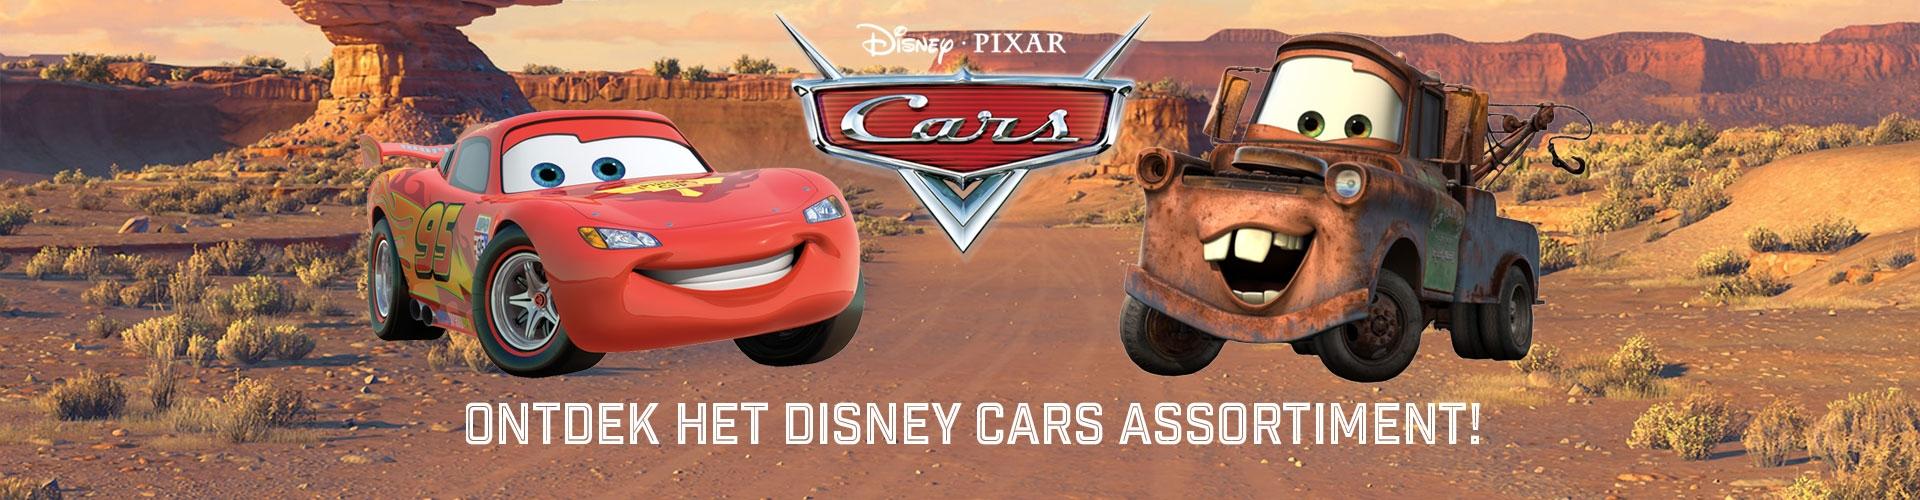 Ruime collectie Disney Cars artikelen!